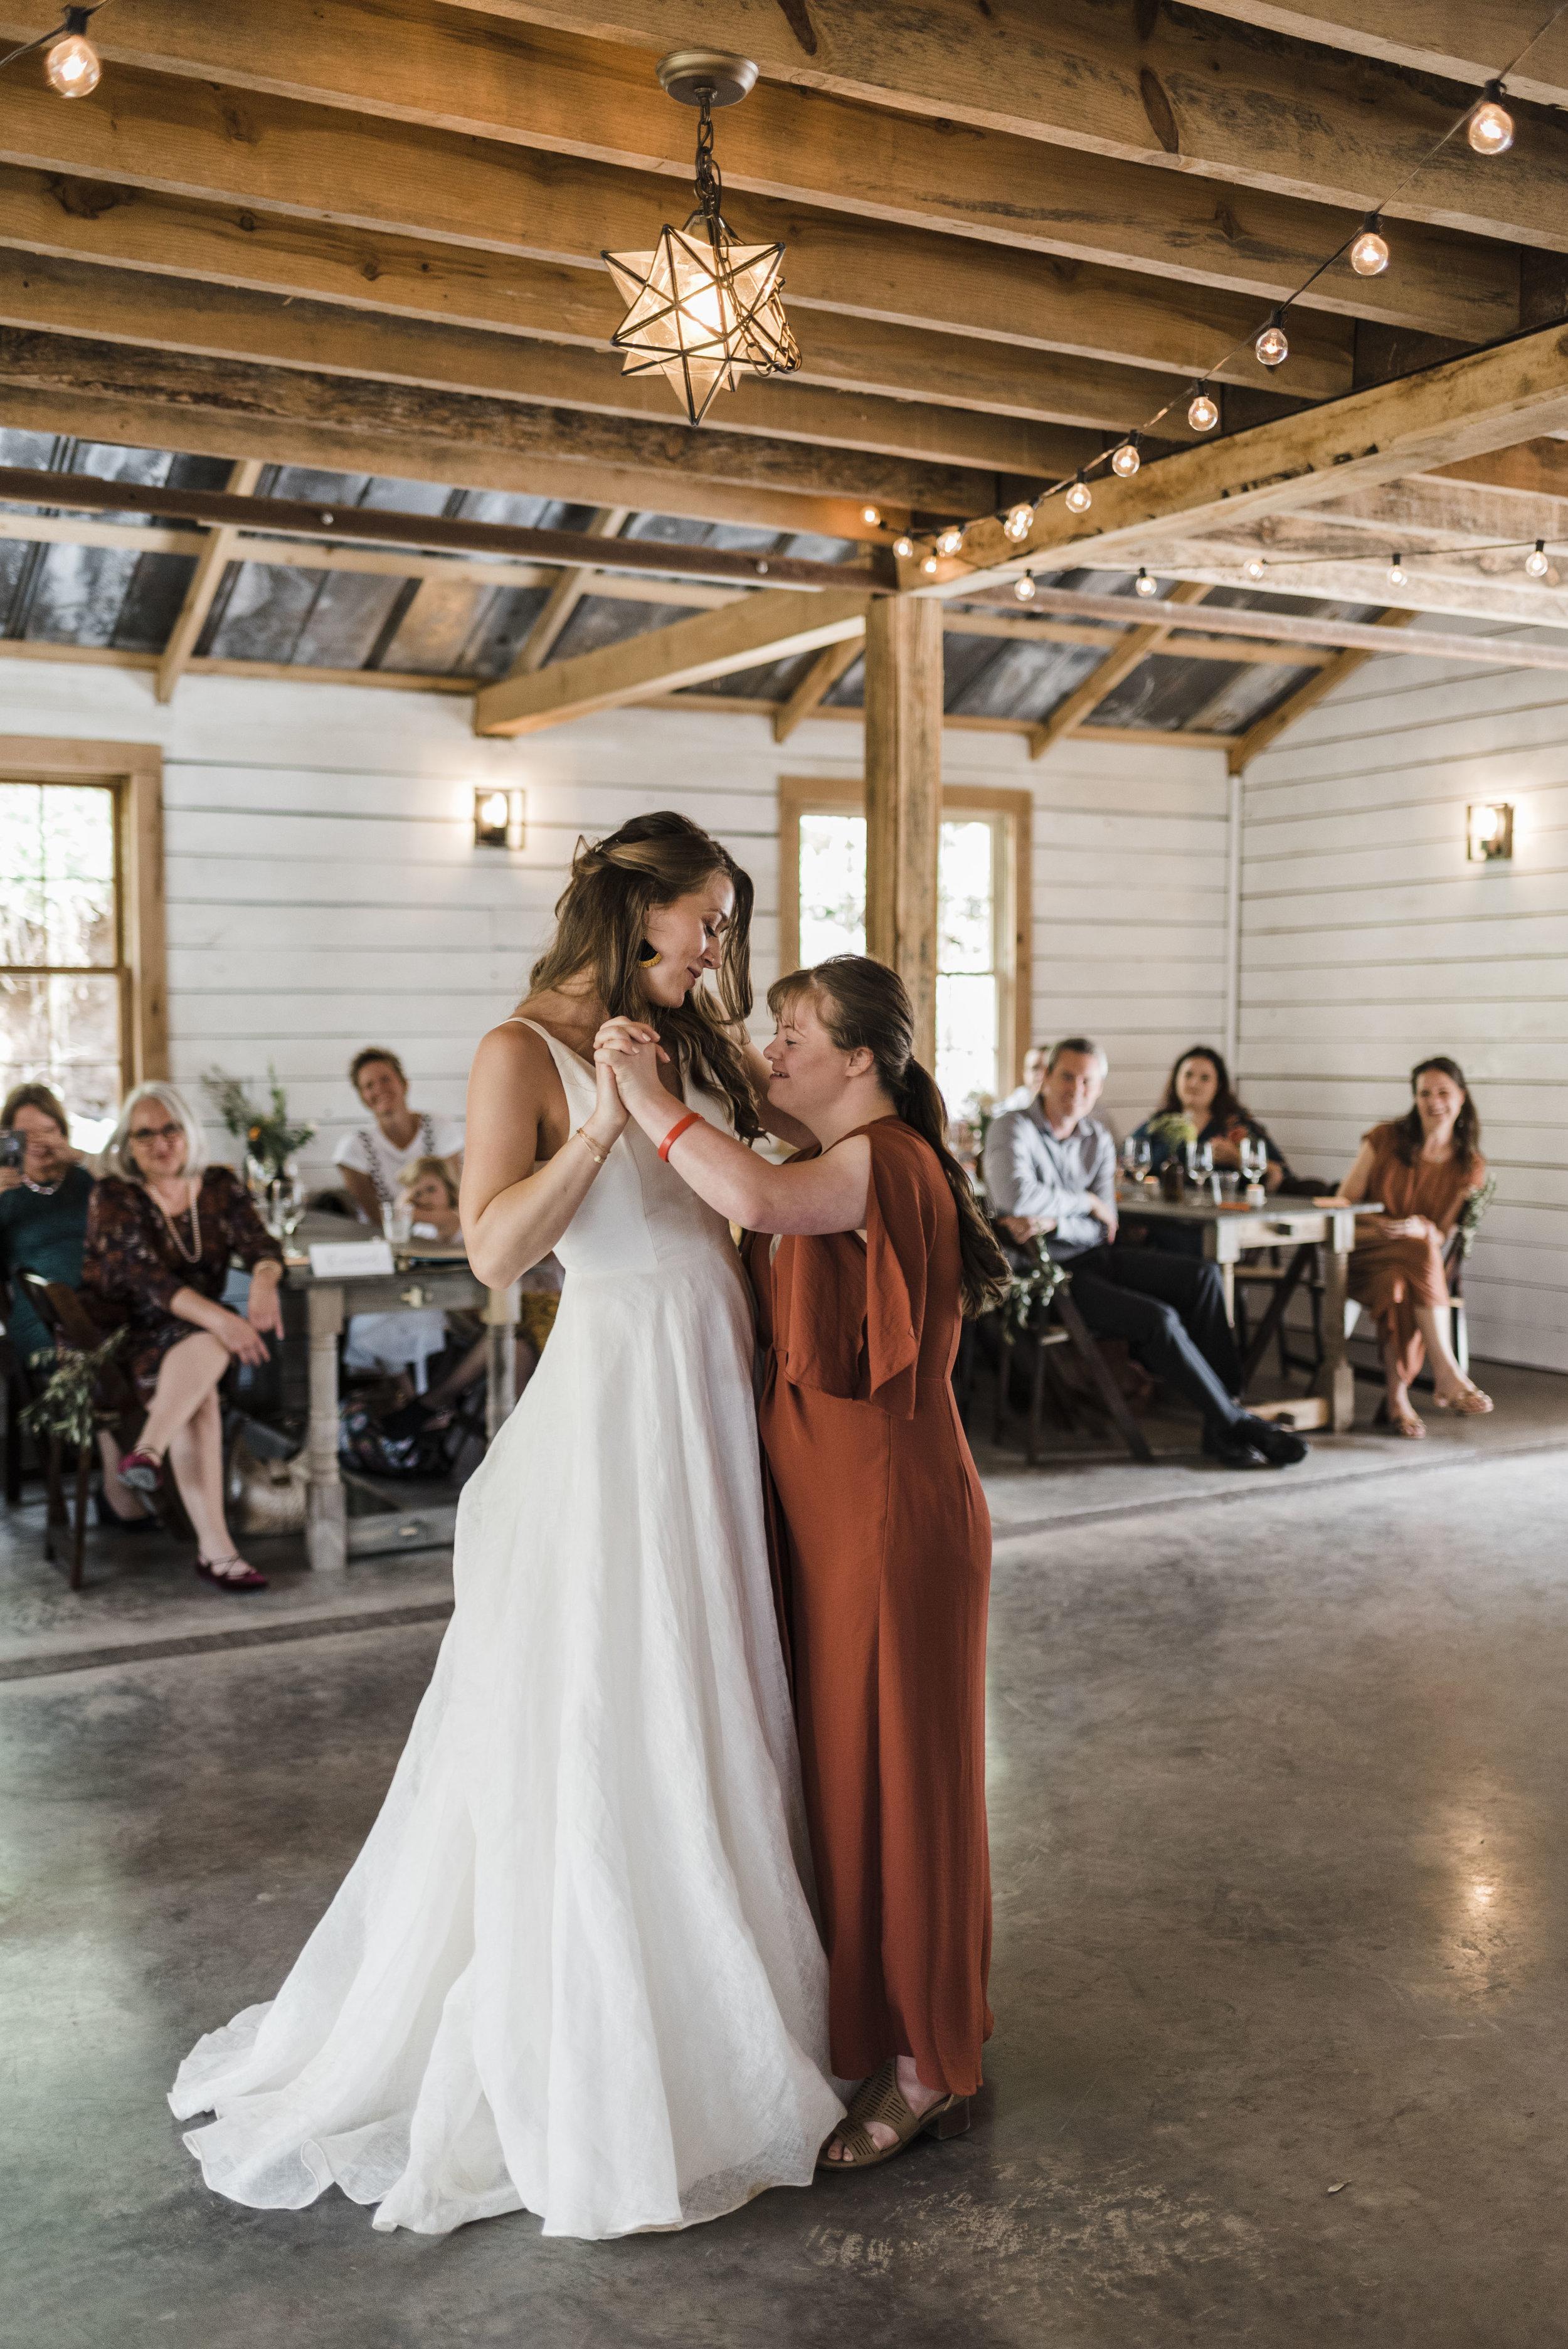 wedding bride sister dance chattanooga Tennessee barn